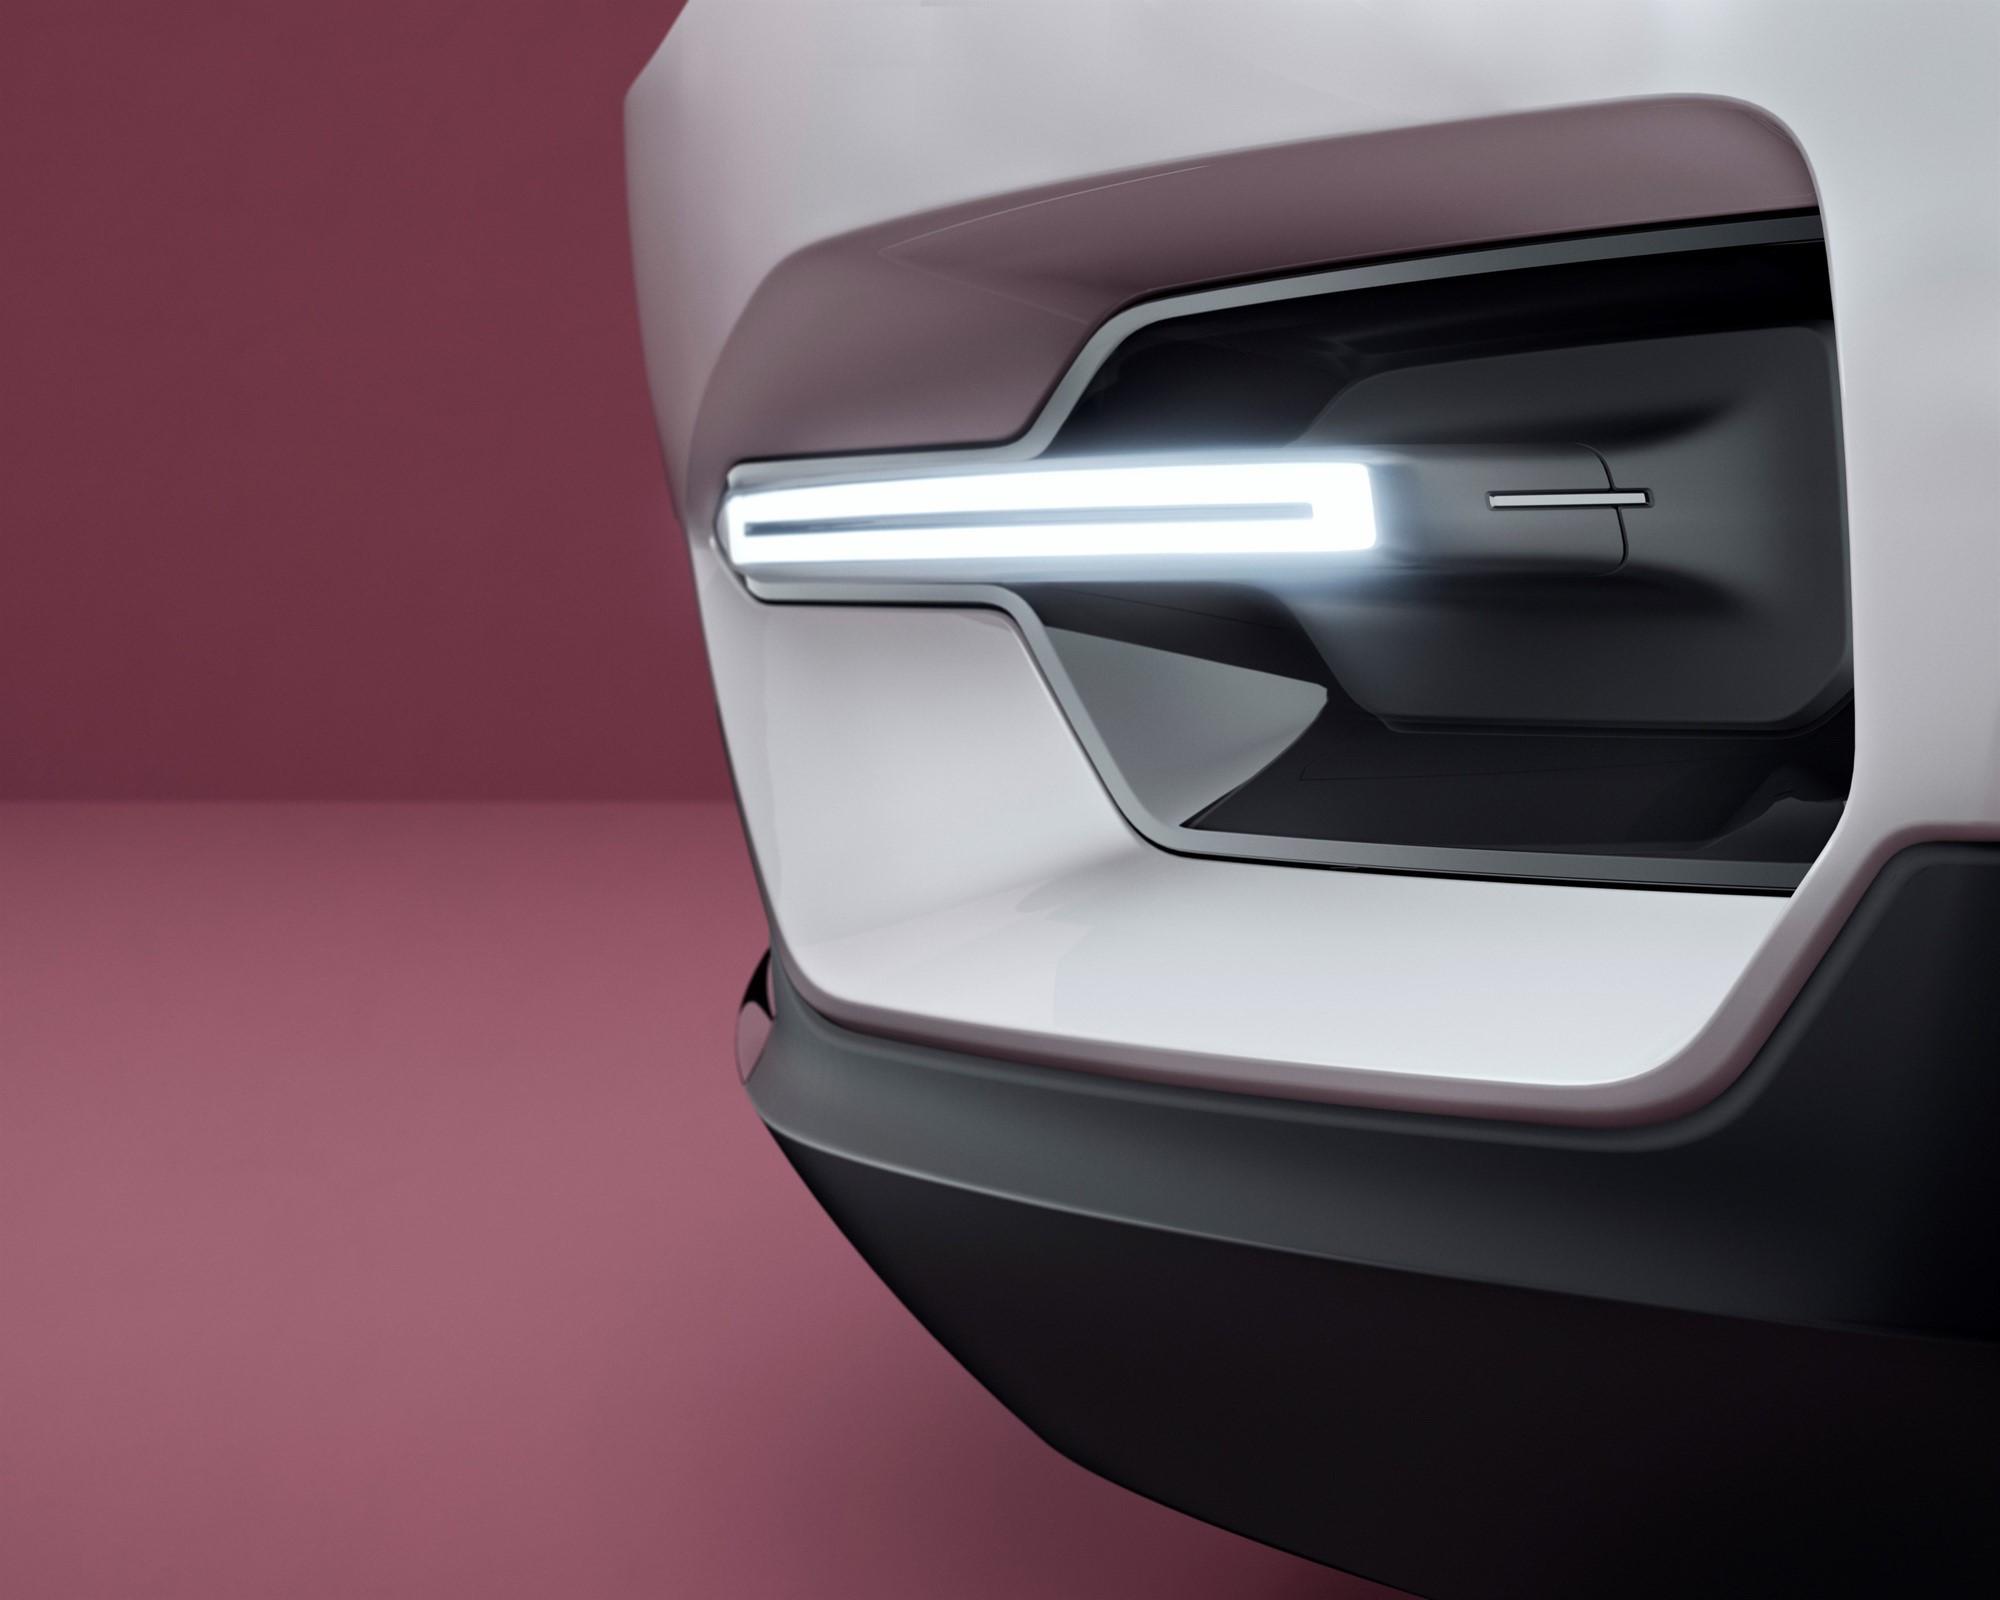 Volvo XC40 Desktop